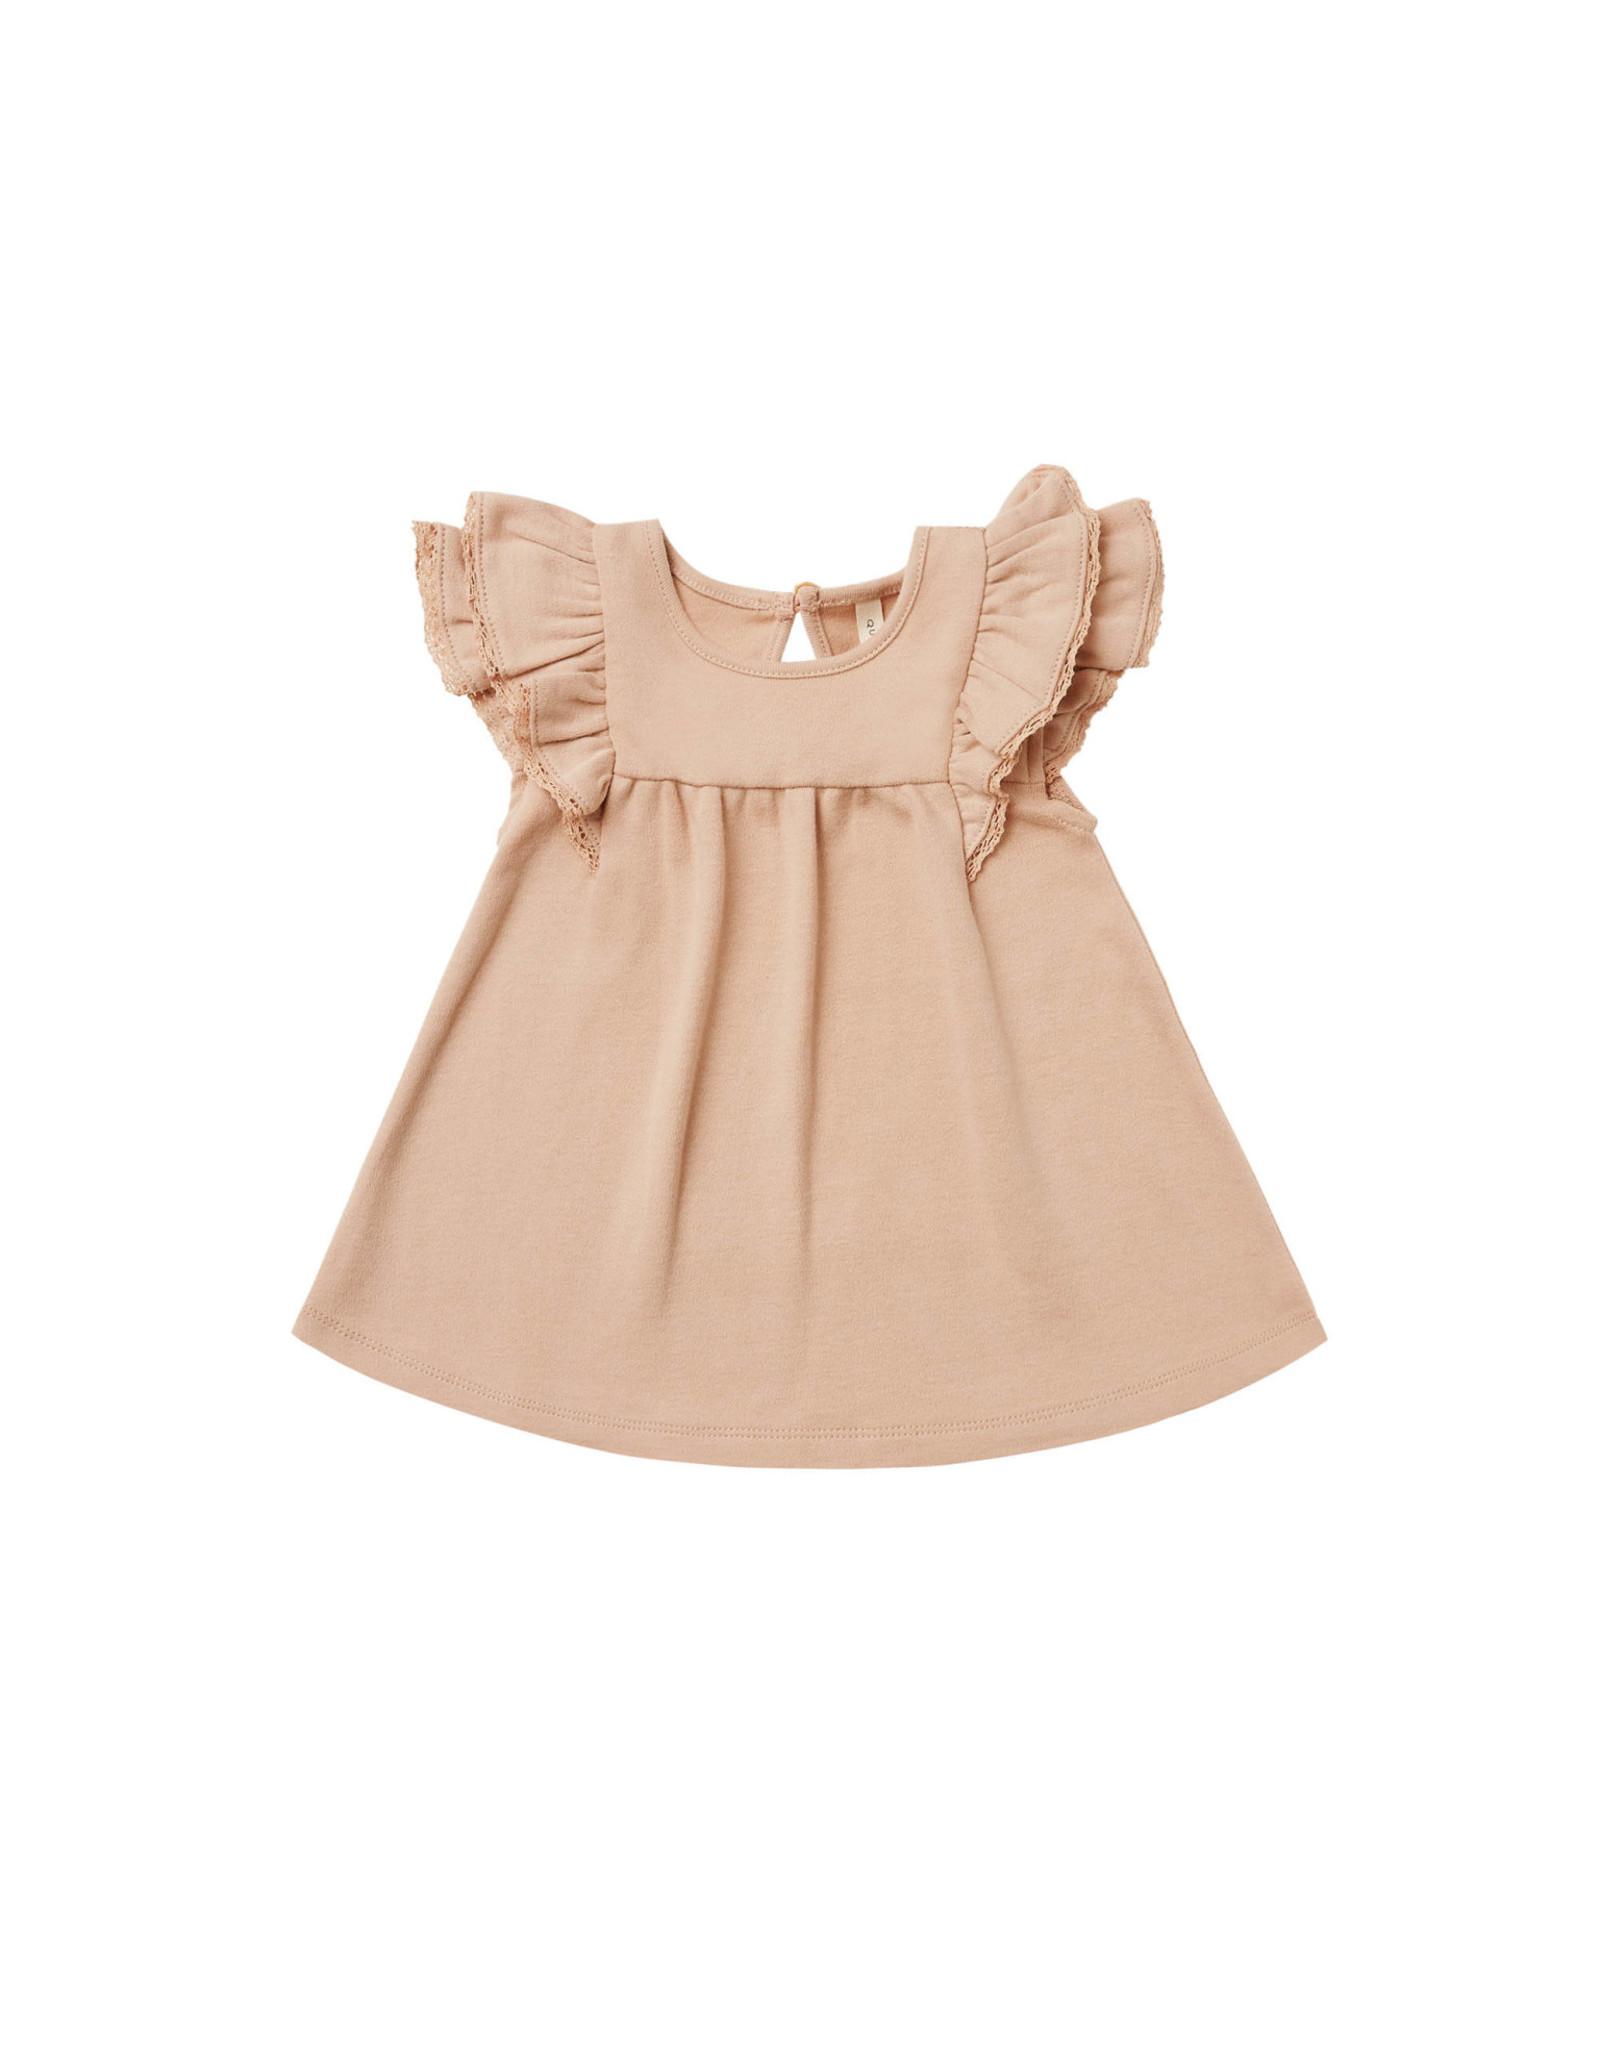 Quincy Mae Quincy Mae Flutter Dress, Petal